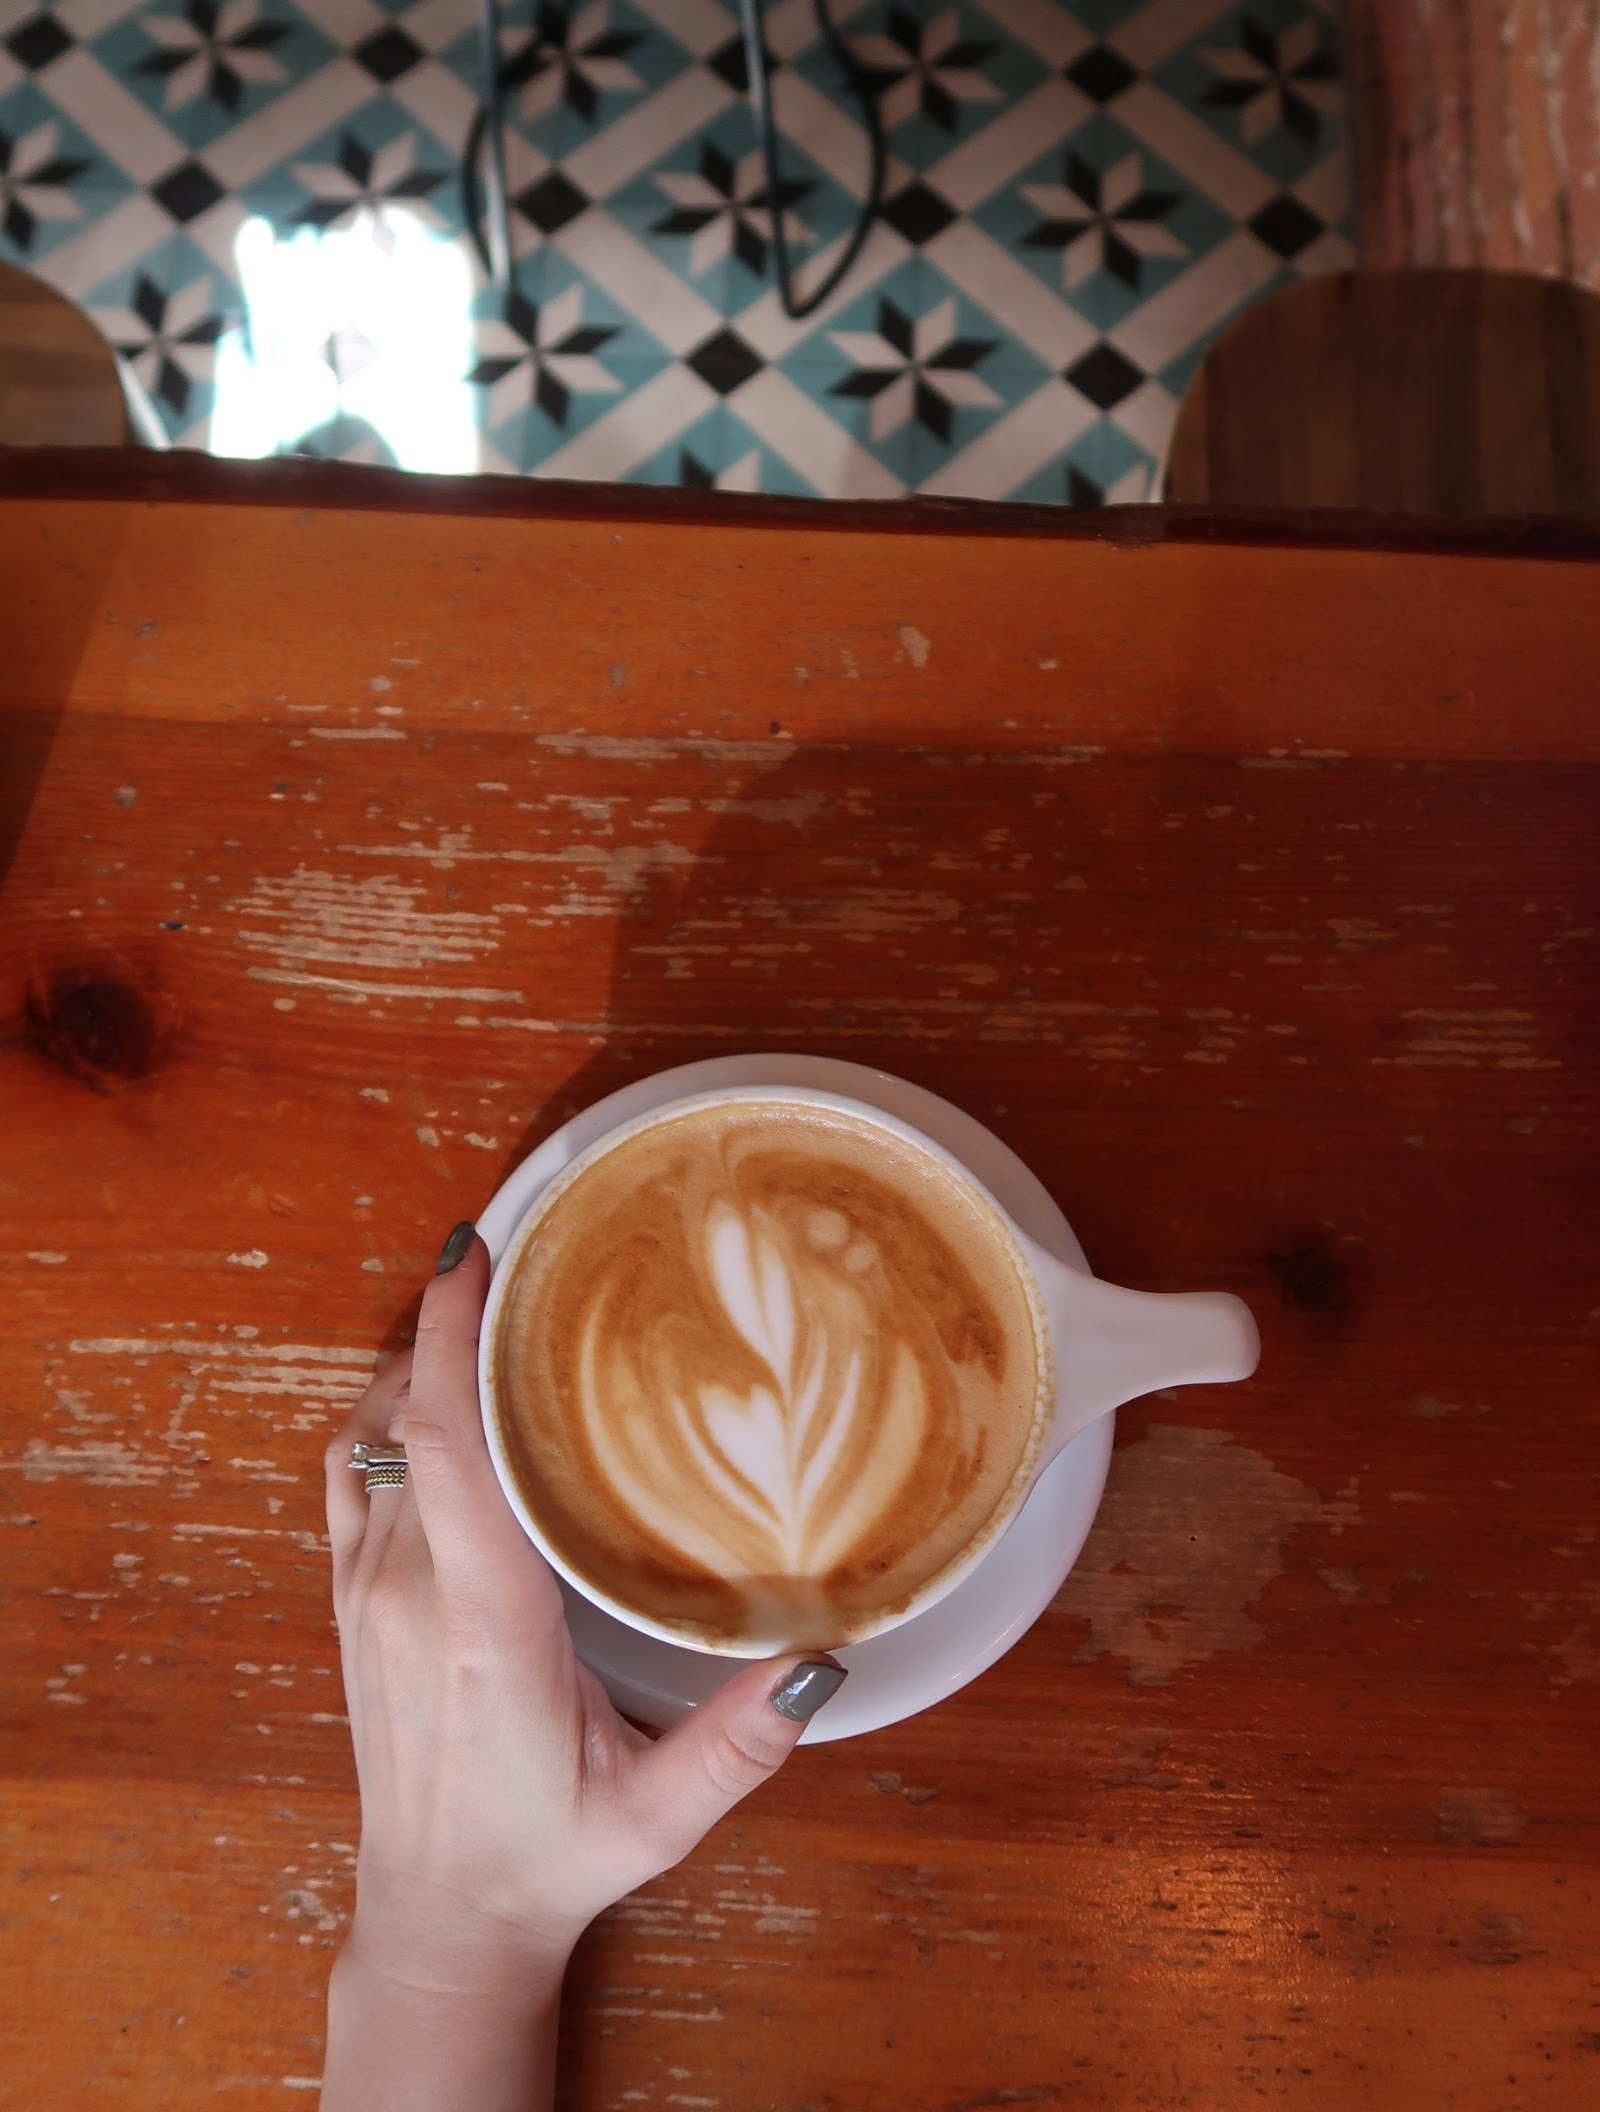 latte art at dripp coffee shop in fullerton, ca